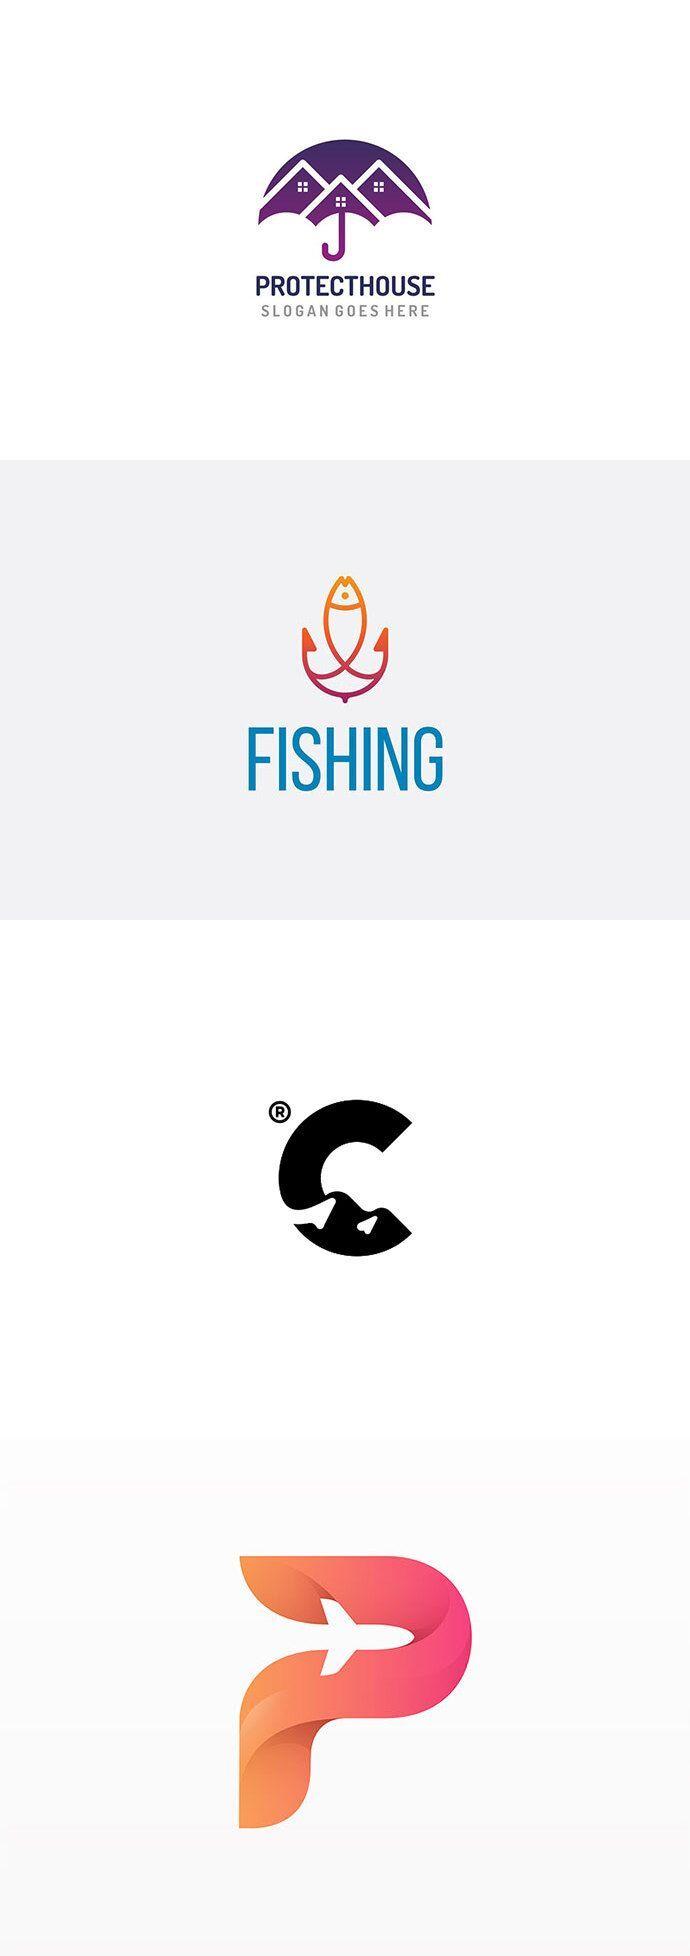 40 Amazing Logo Designs 2017 Gute Ideen zu bekommen ist gar nicht so schlecht als Inspiration …   – dinners